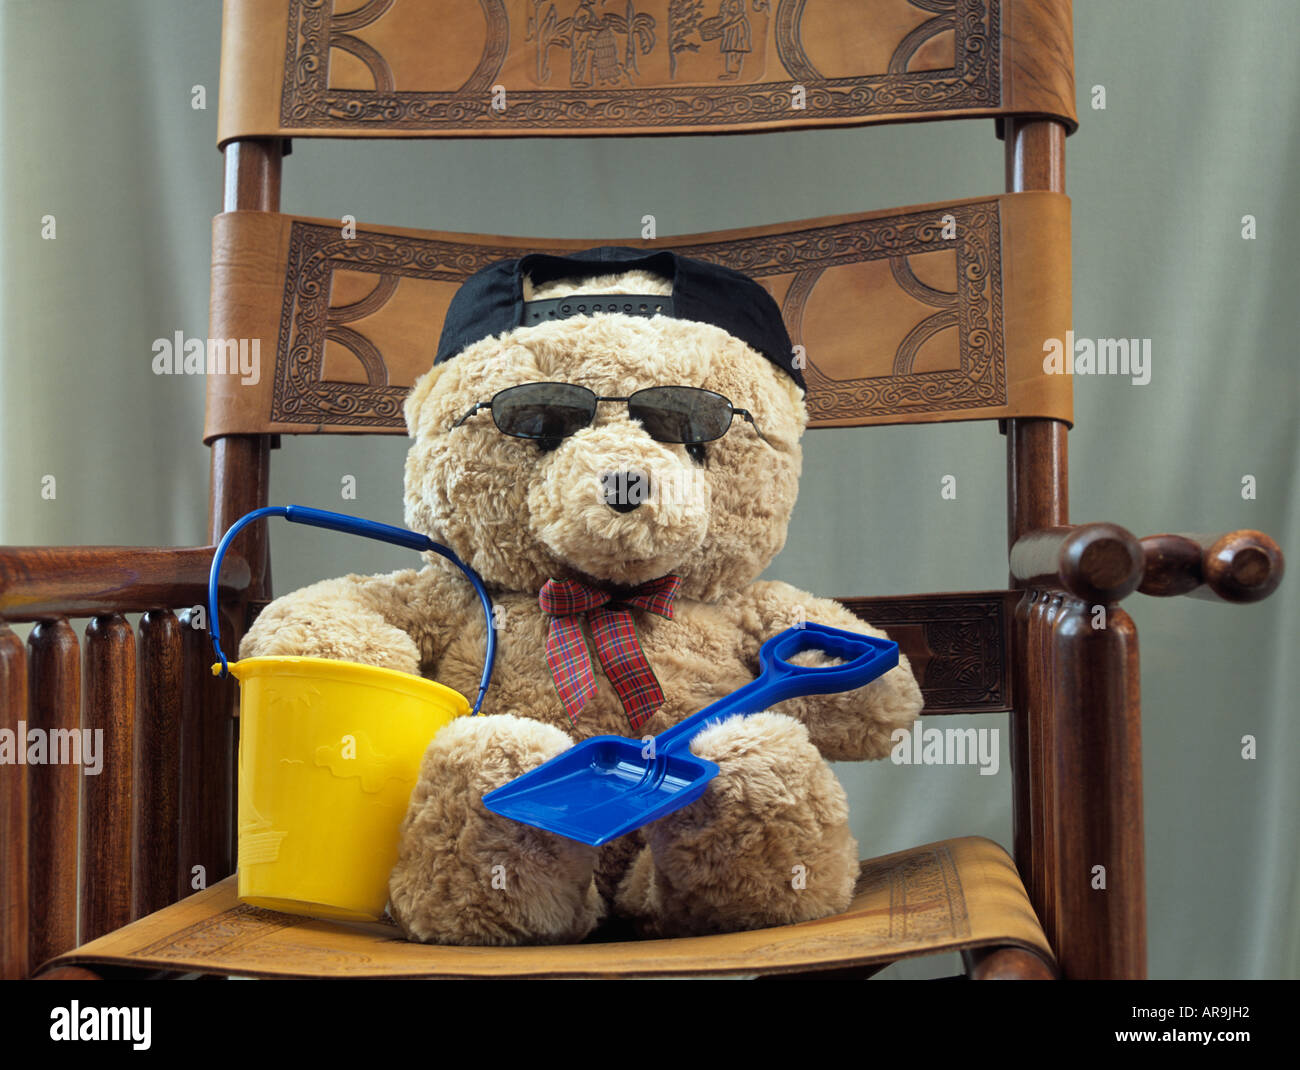 Teddy Bear Sunglasses Stockfotos & Teddy Bear Sunglasses Bilder ...